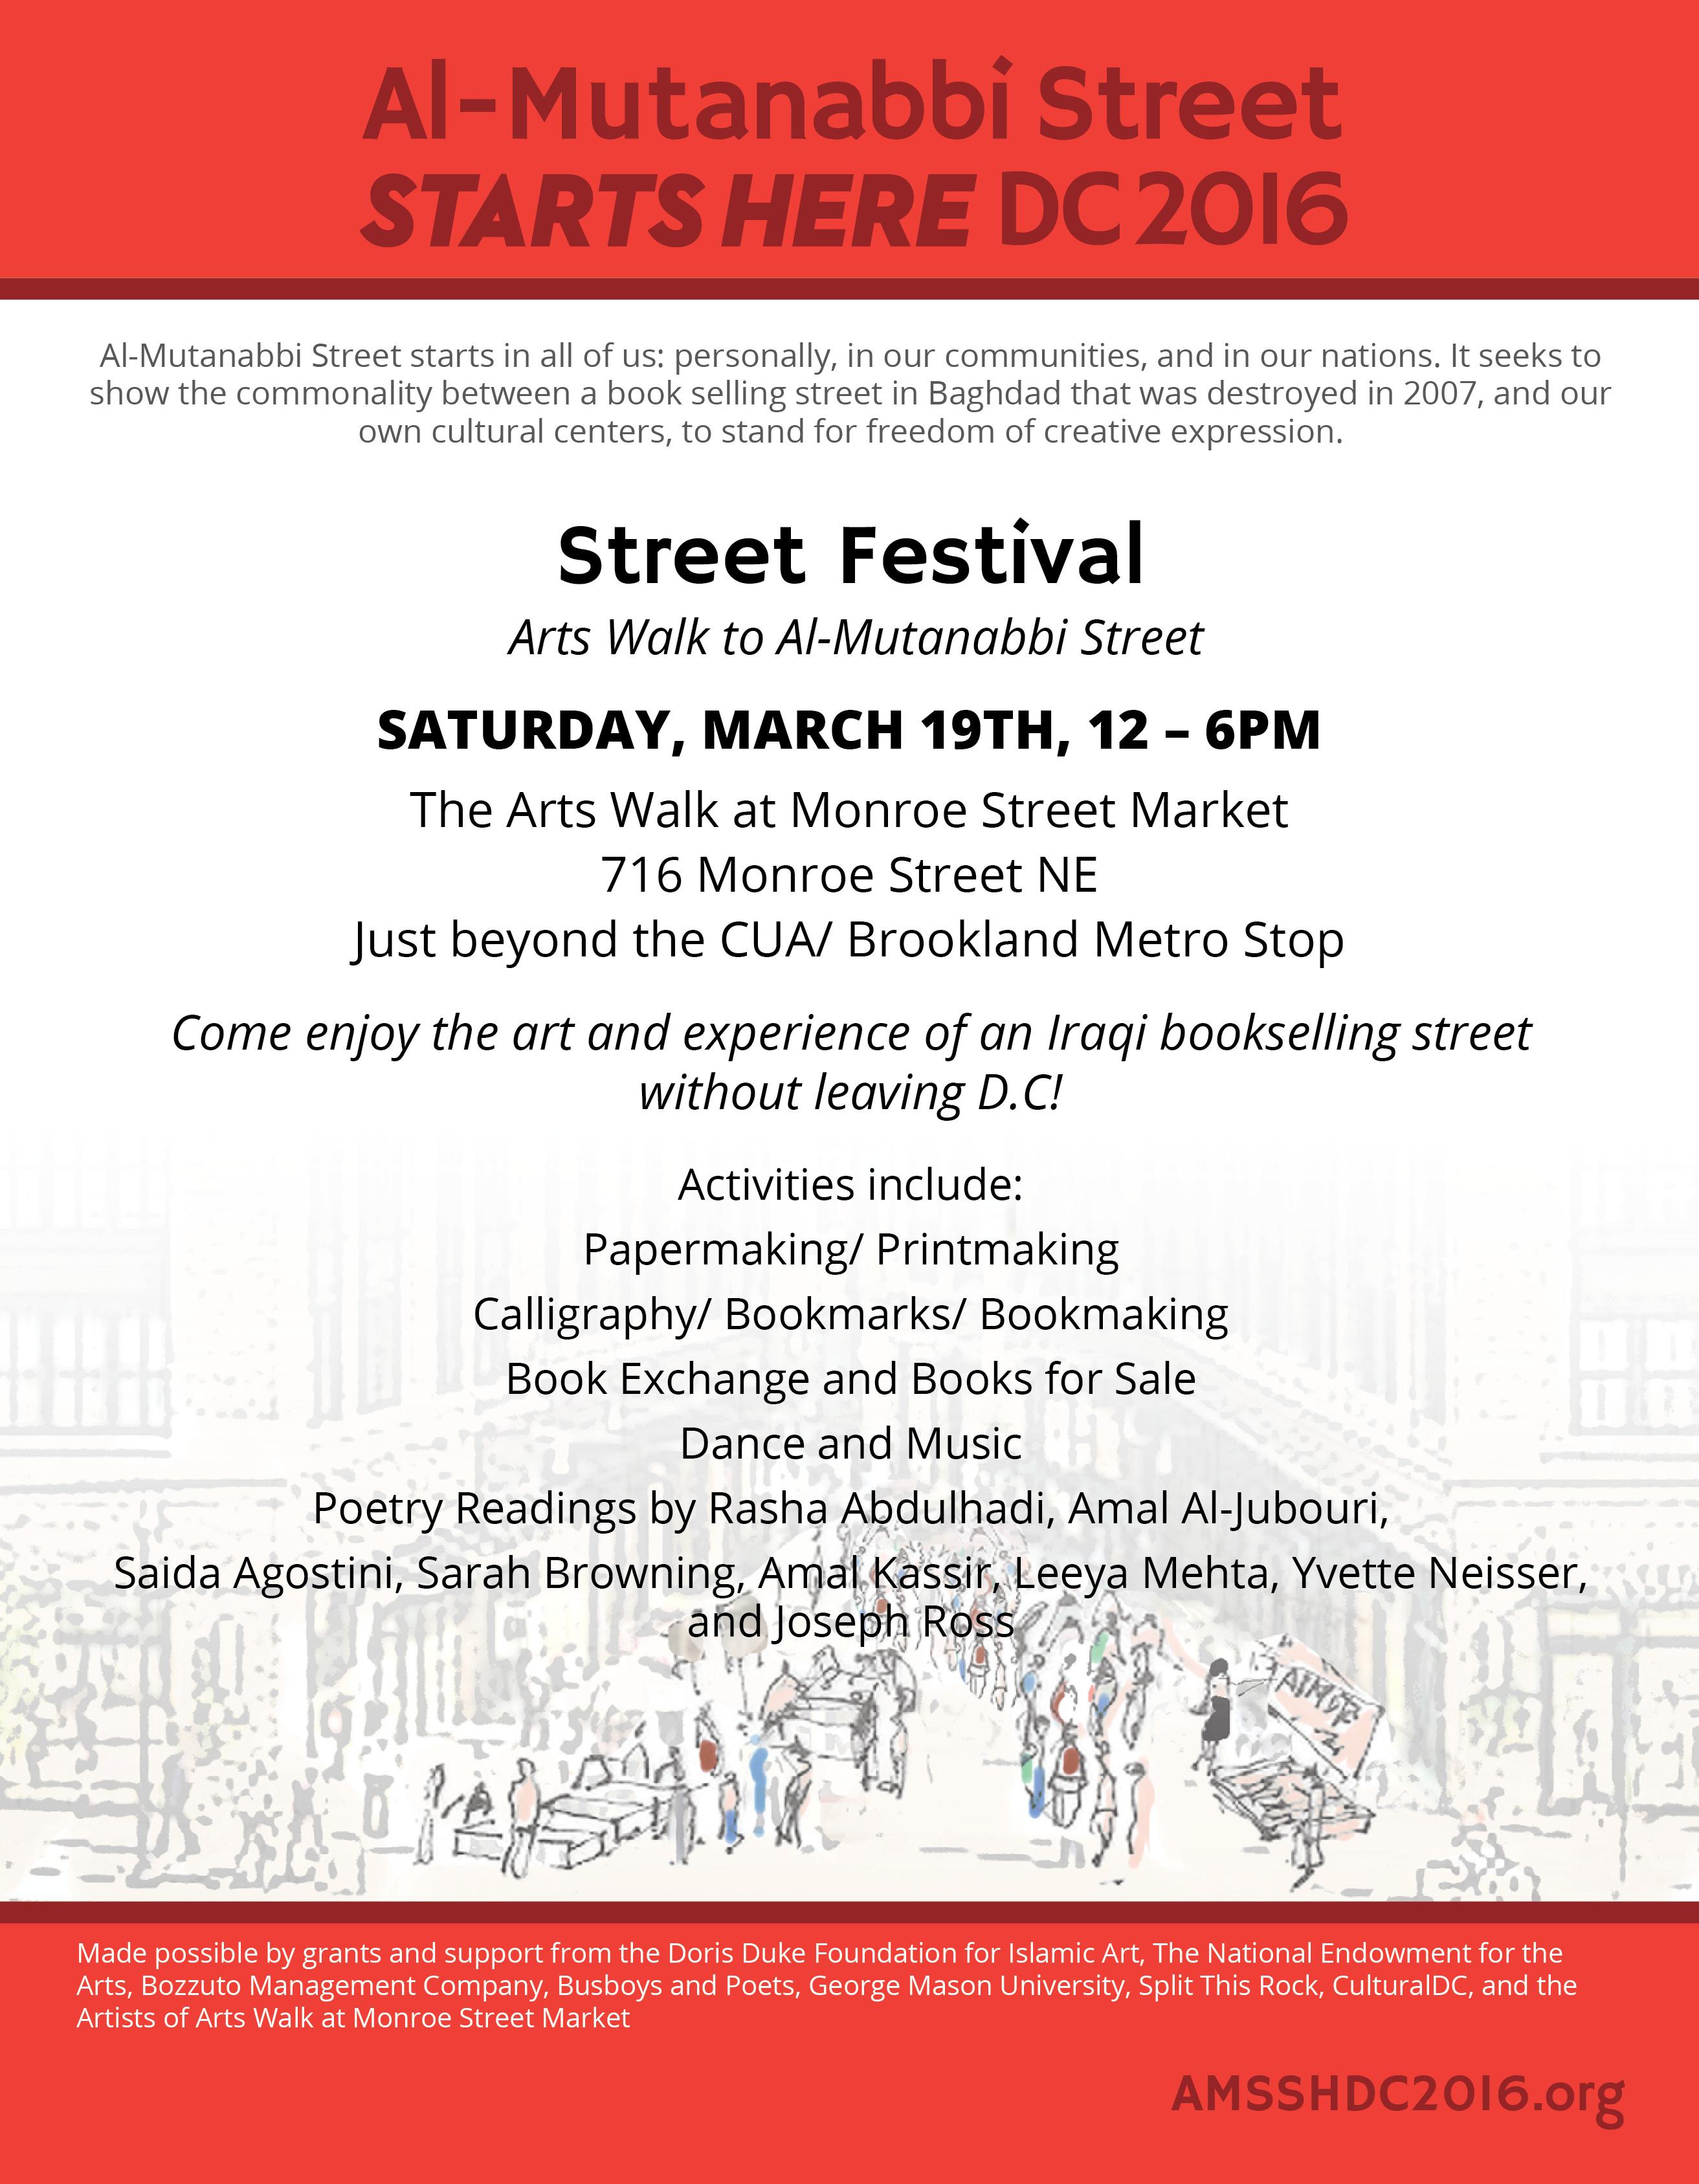 AMSSH Street Festival Flyer 3-19-2016